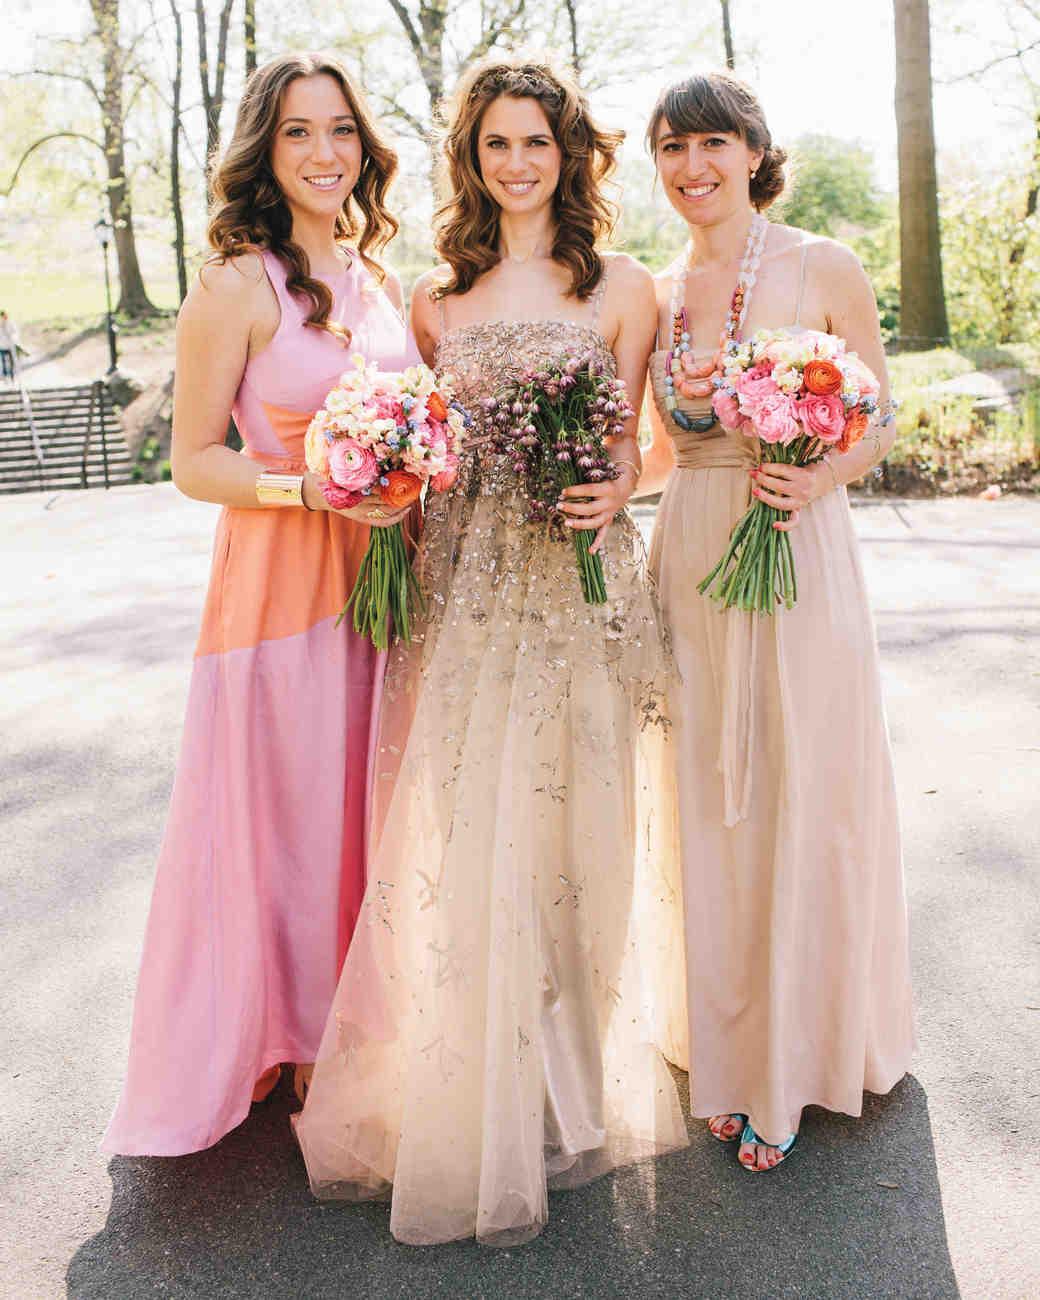 Jewish Wedding Dresses: 17 Jewish Wedding Traditions For Your Big Day